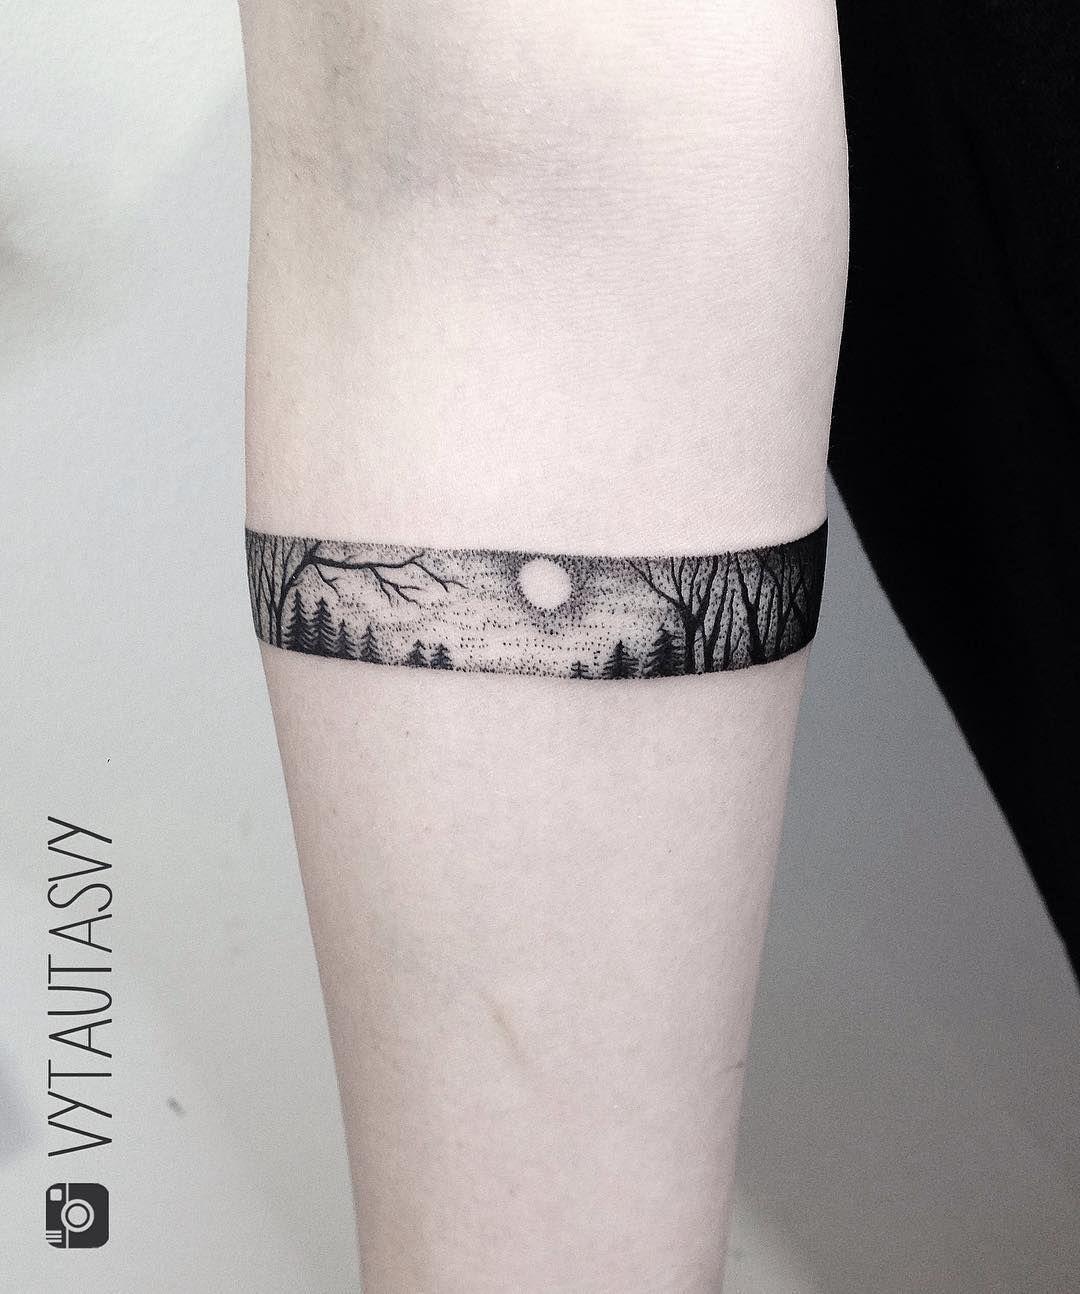 Pin by Lexi Jameson on tatuaje Arm band tattoo, Band